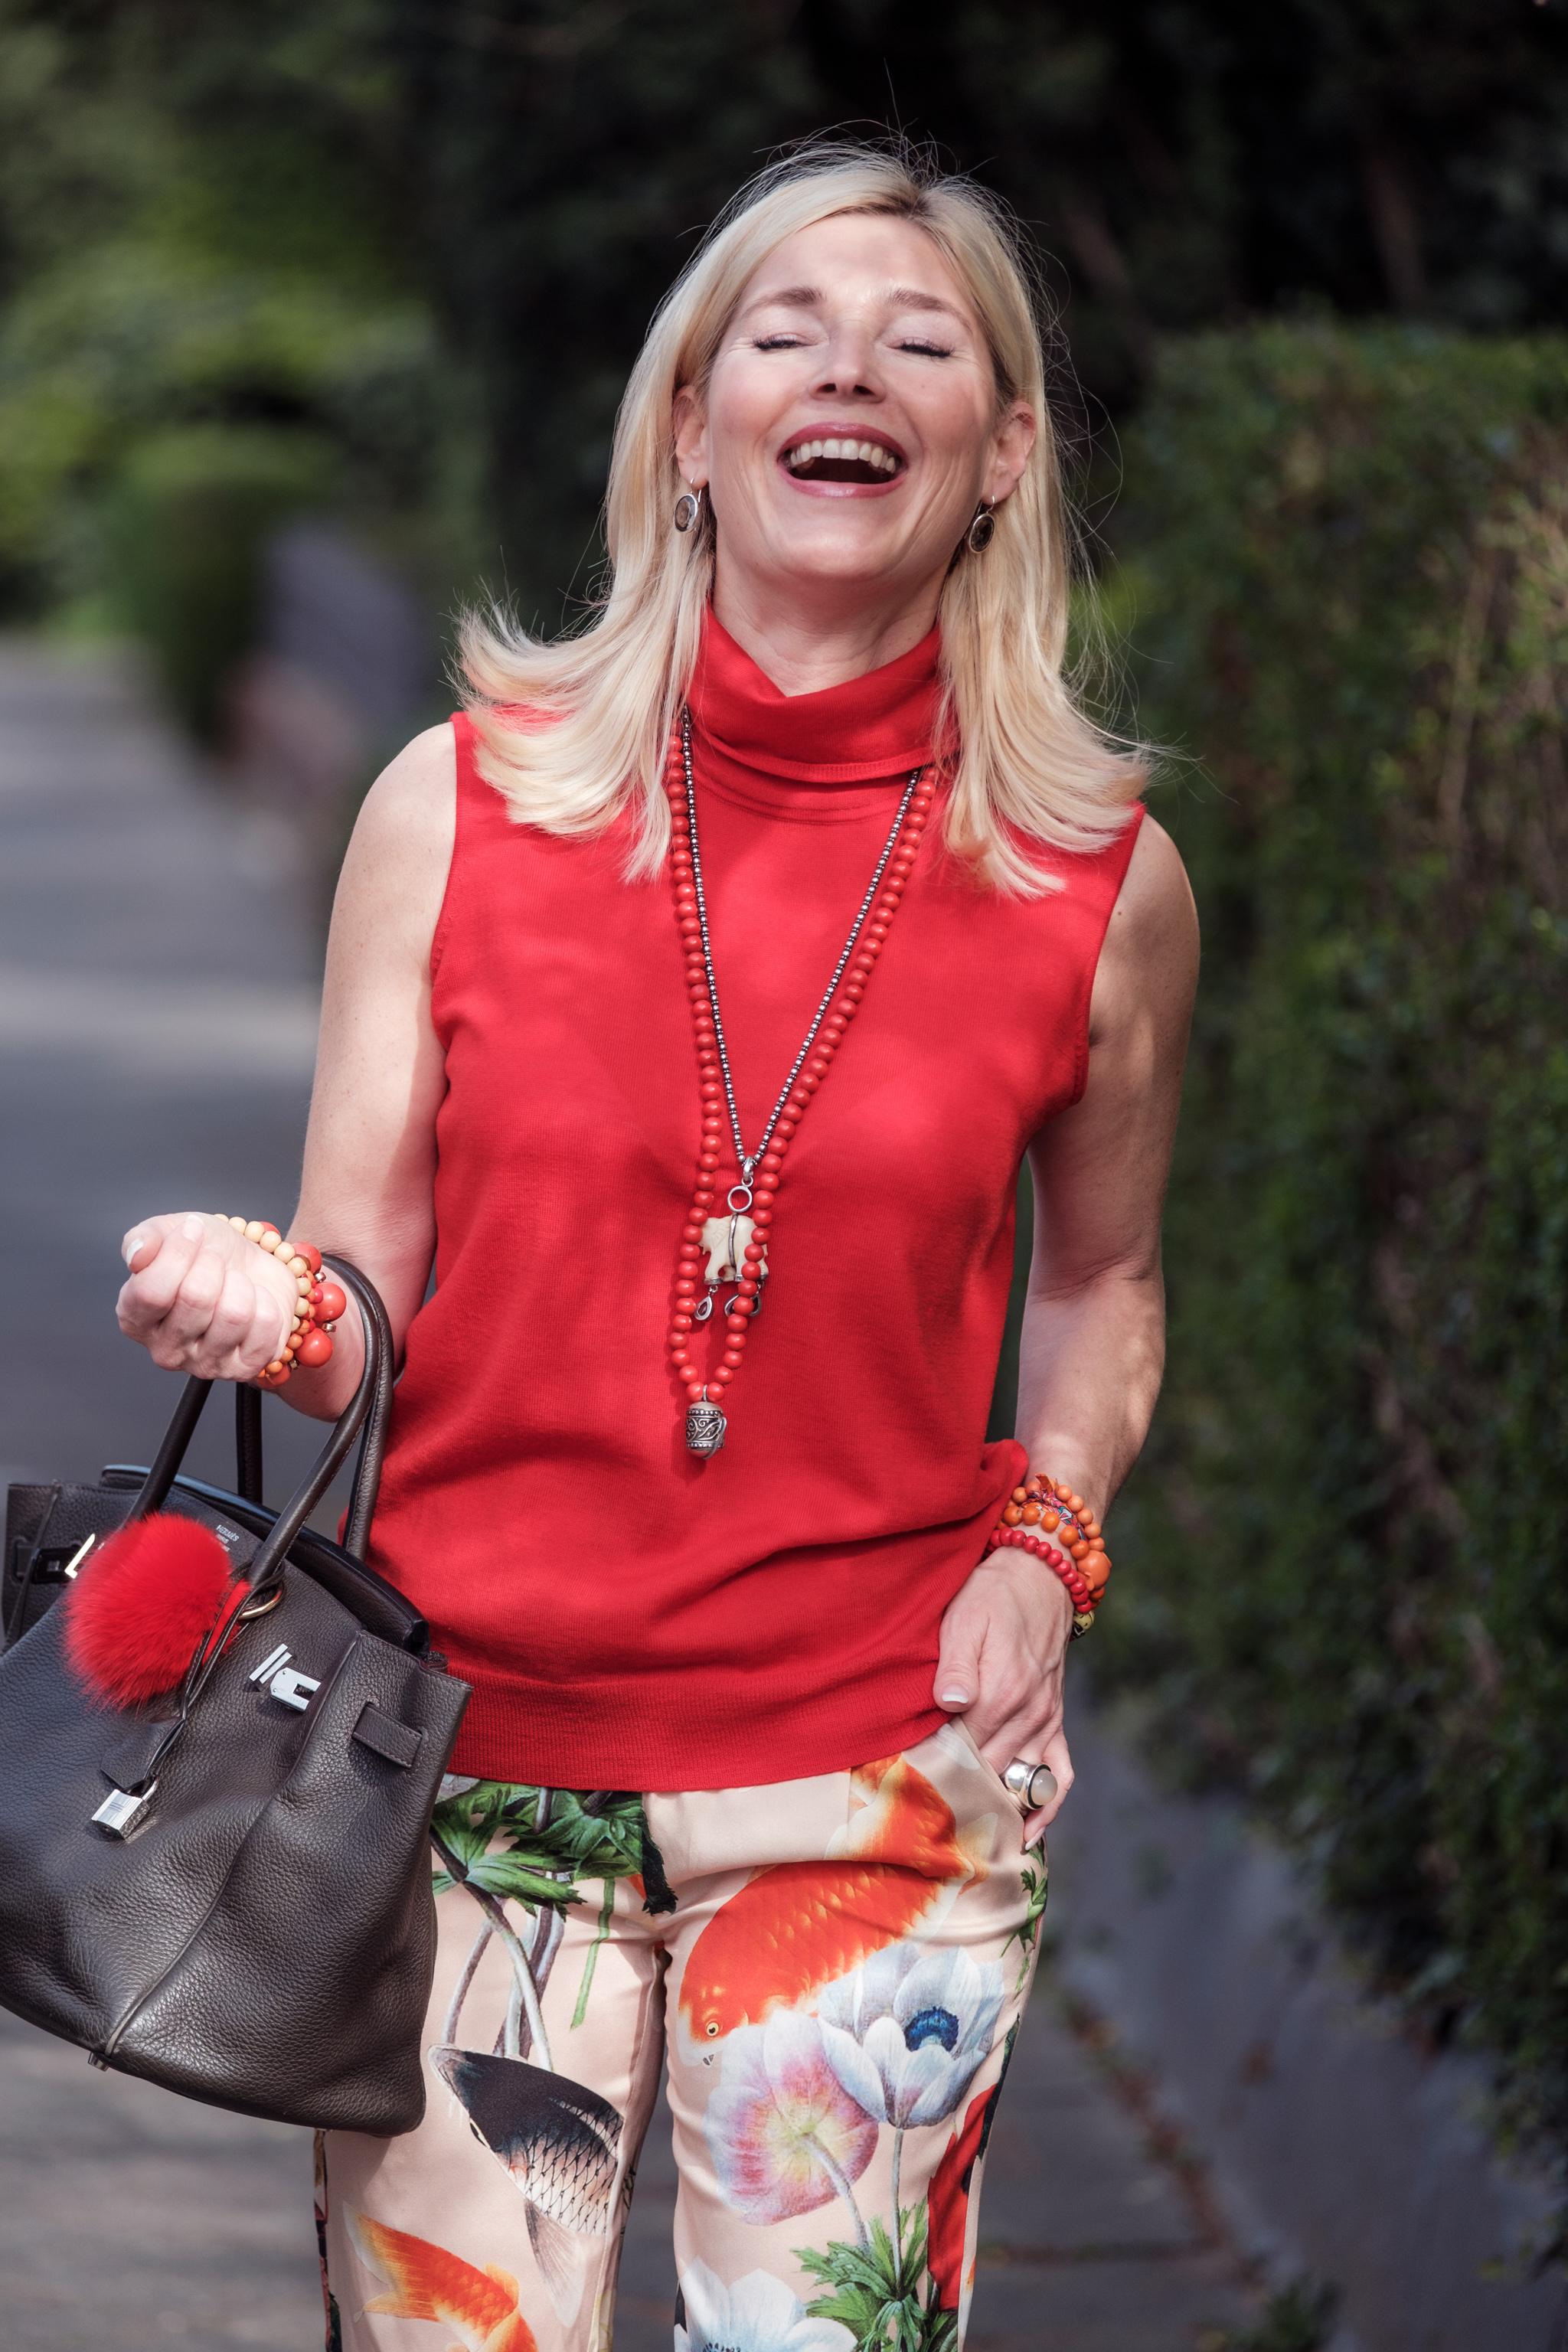 Spaß bei der Arbeit, Anni Carlsson Look, Anni Carlsson Outfit, Fashion-Blog, Lieblingsstil.com,